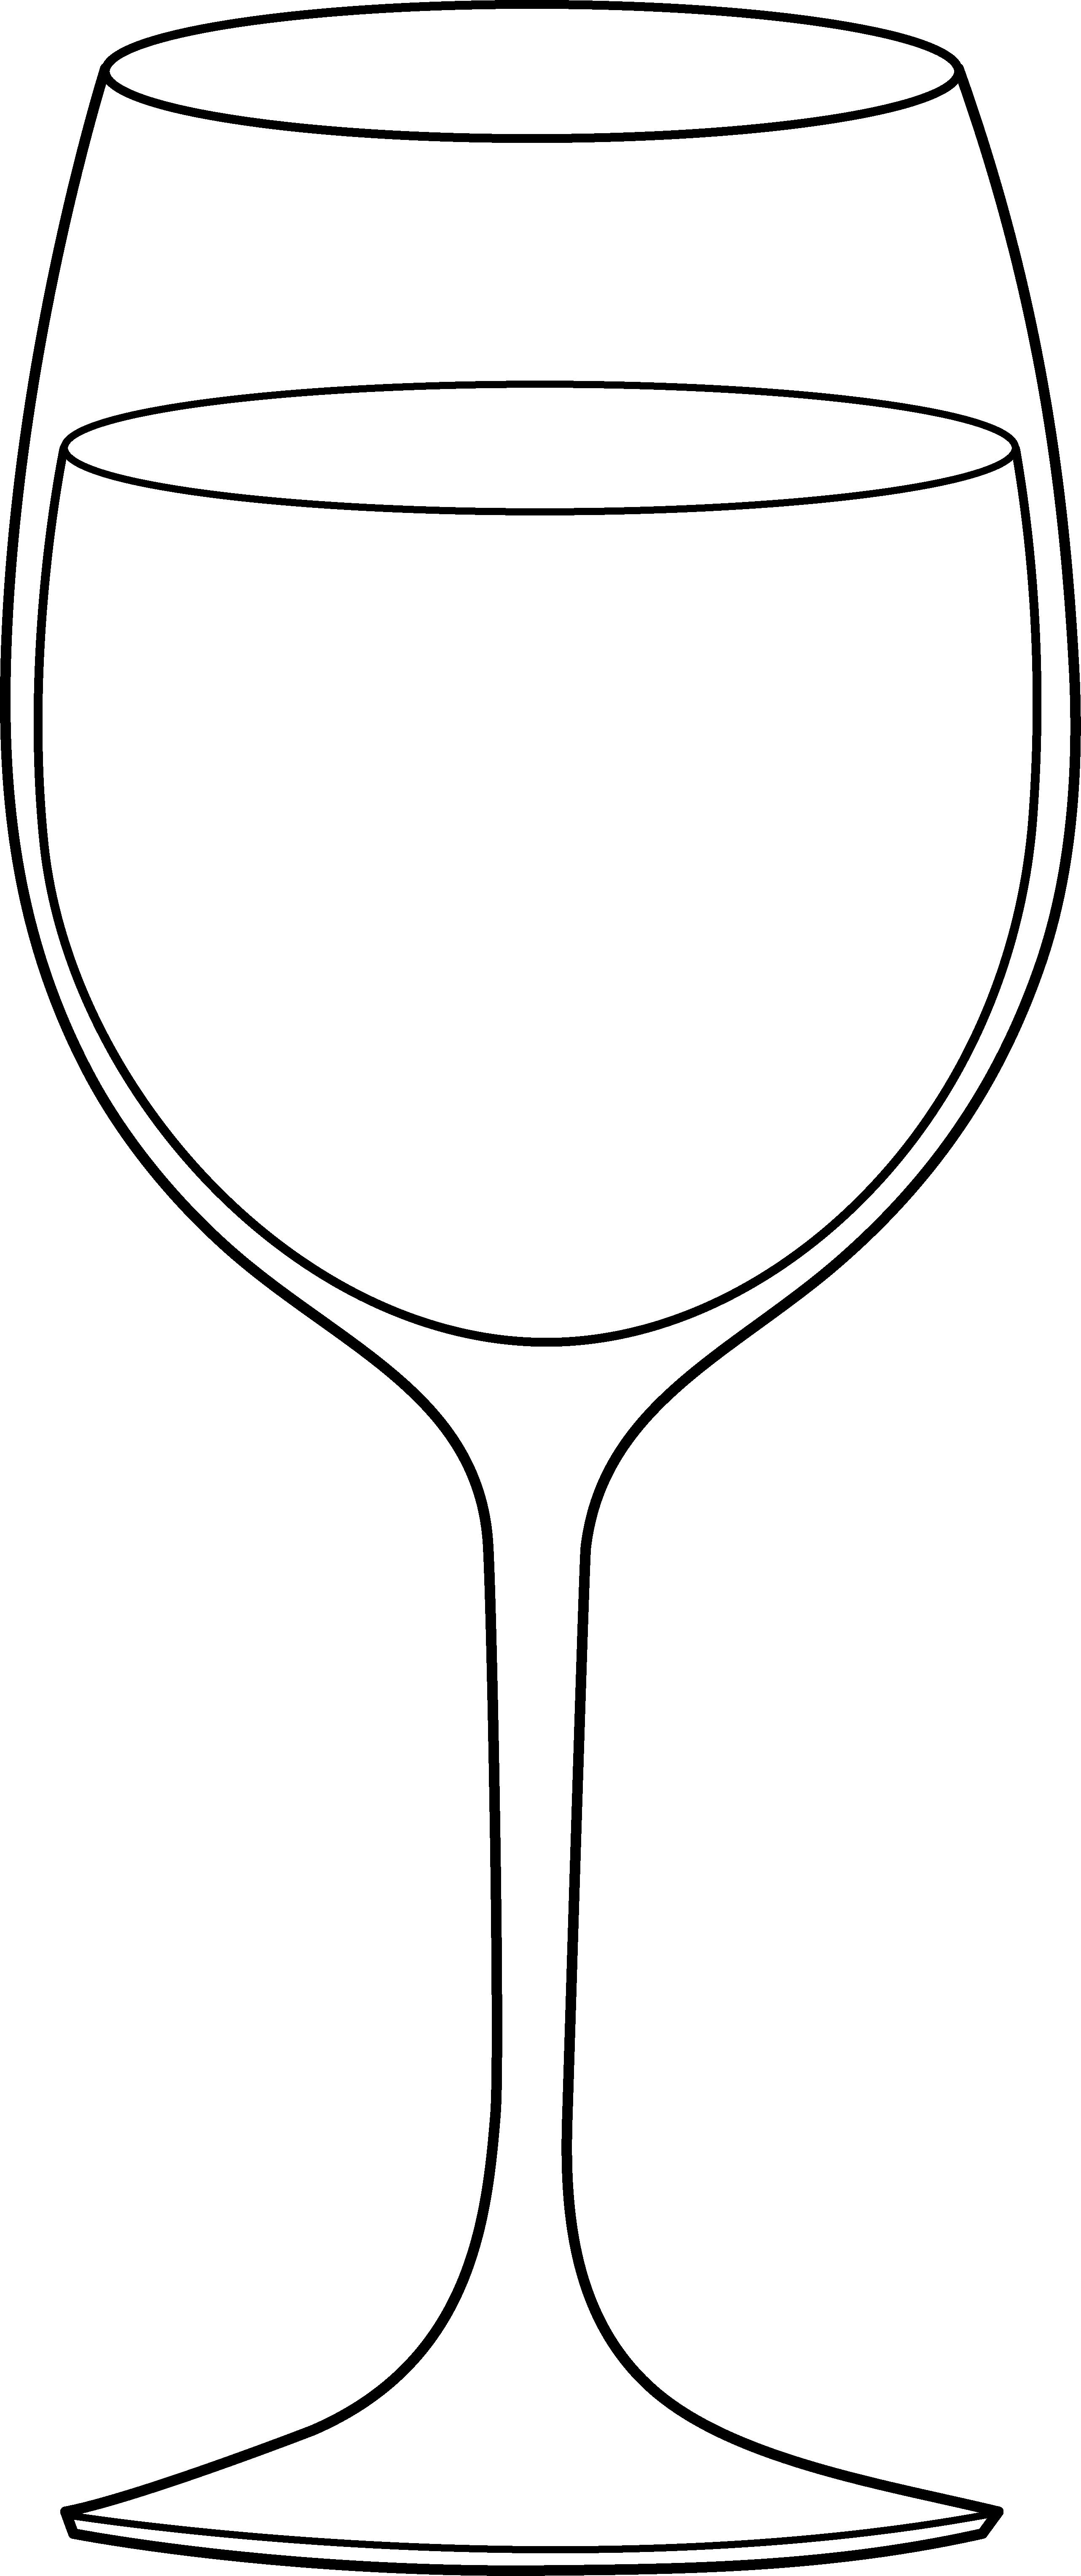 Glass clipart drinking glass. Wine line art free